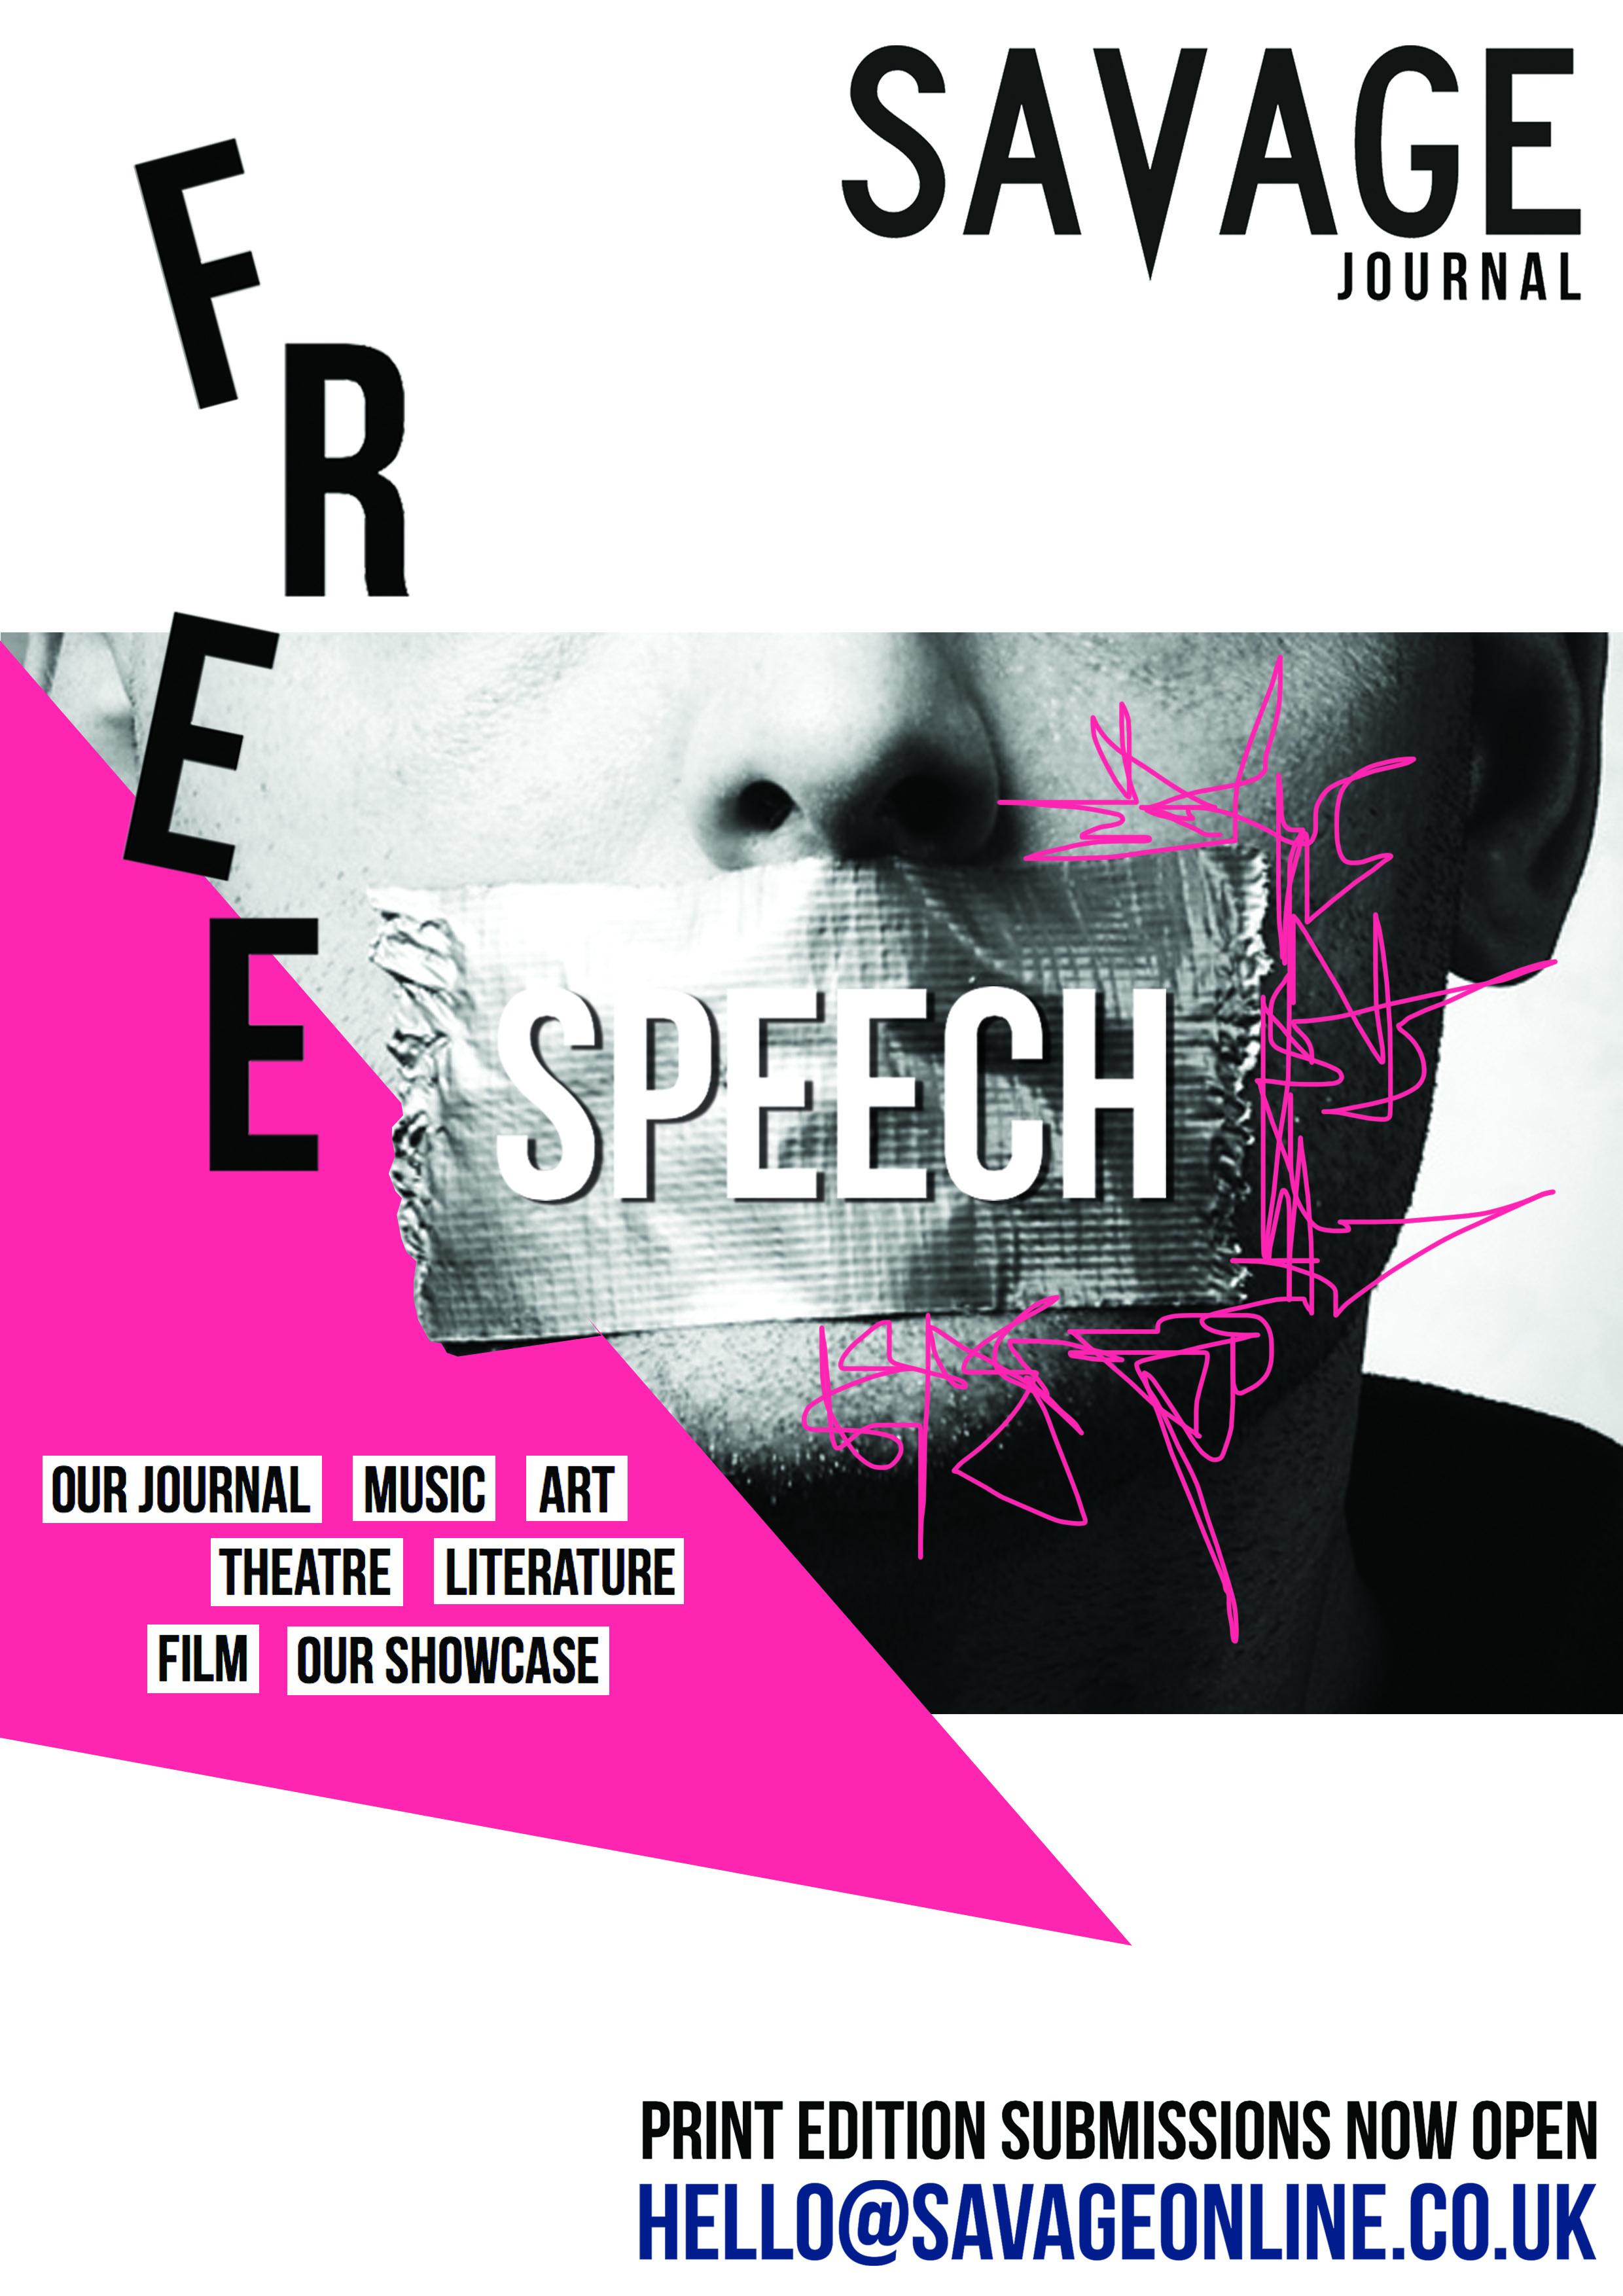 FREE SPEECH GRAPHIC2